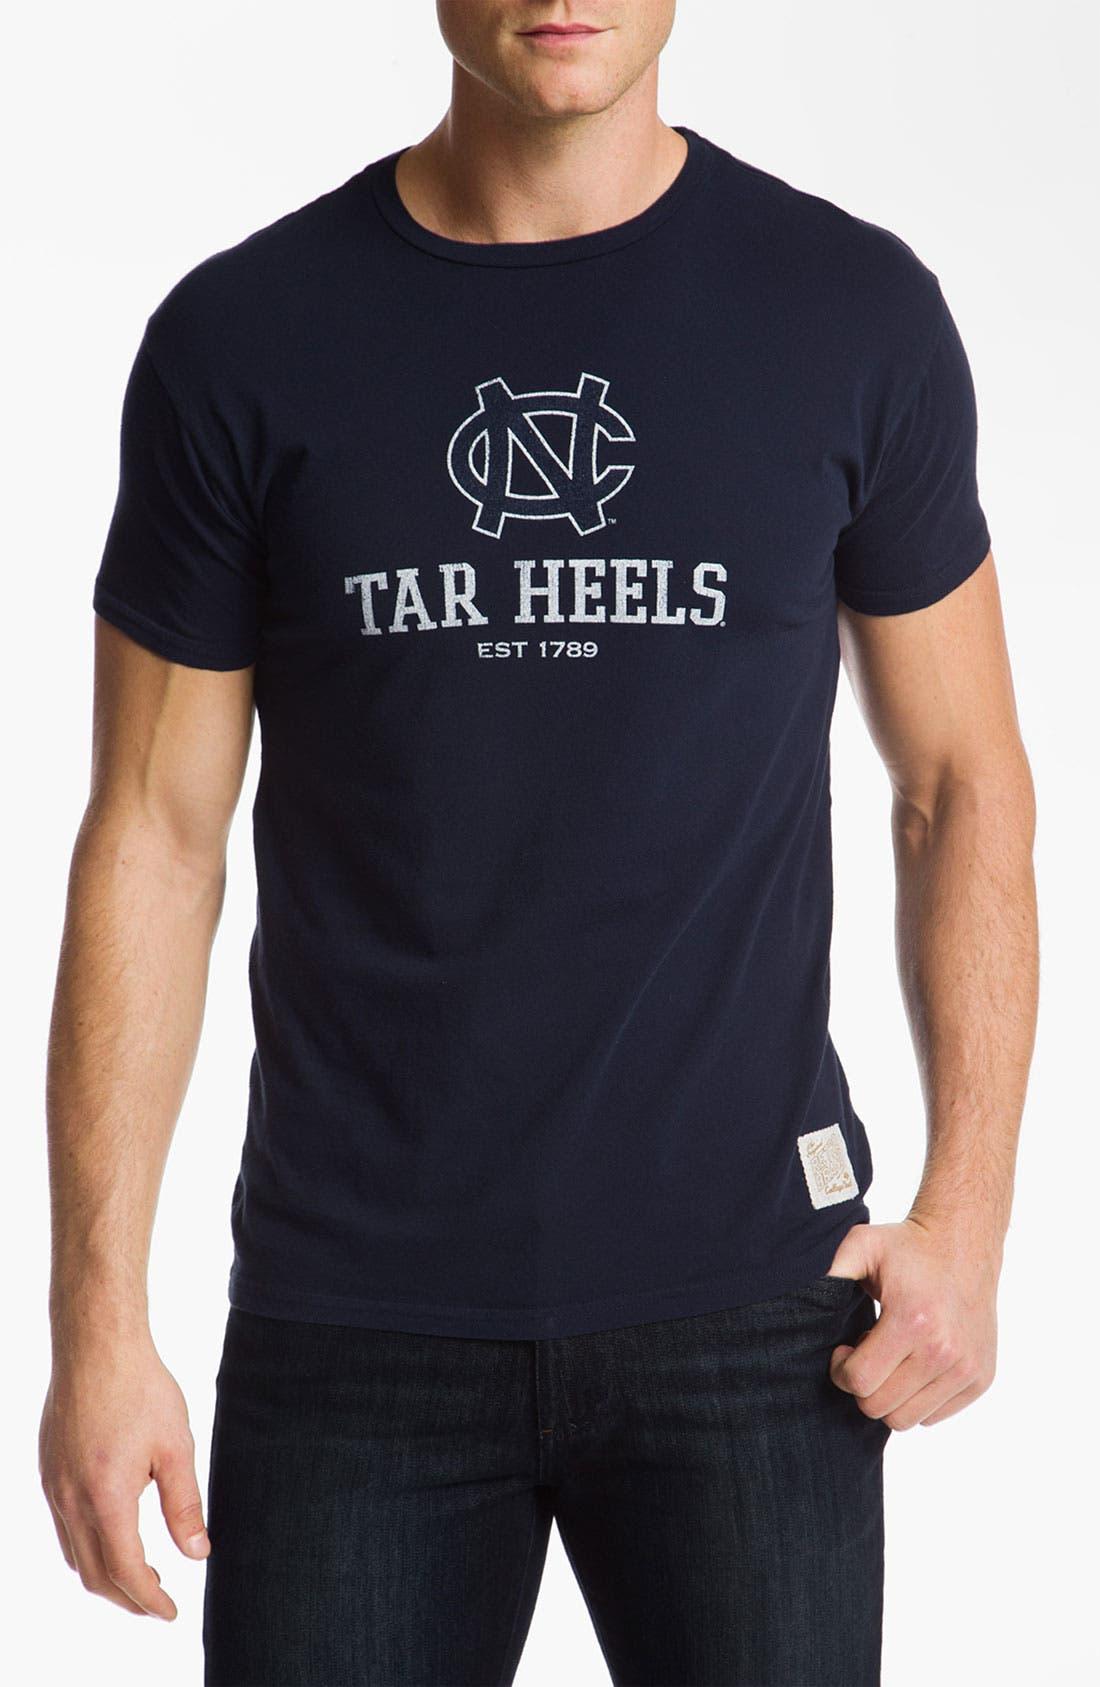 Main Image - Retro Brand 'Tar Heels - Est. 1789' T-Shirt